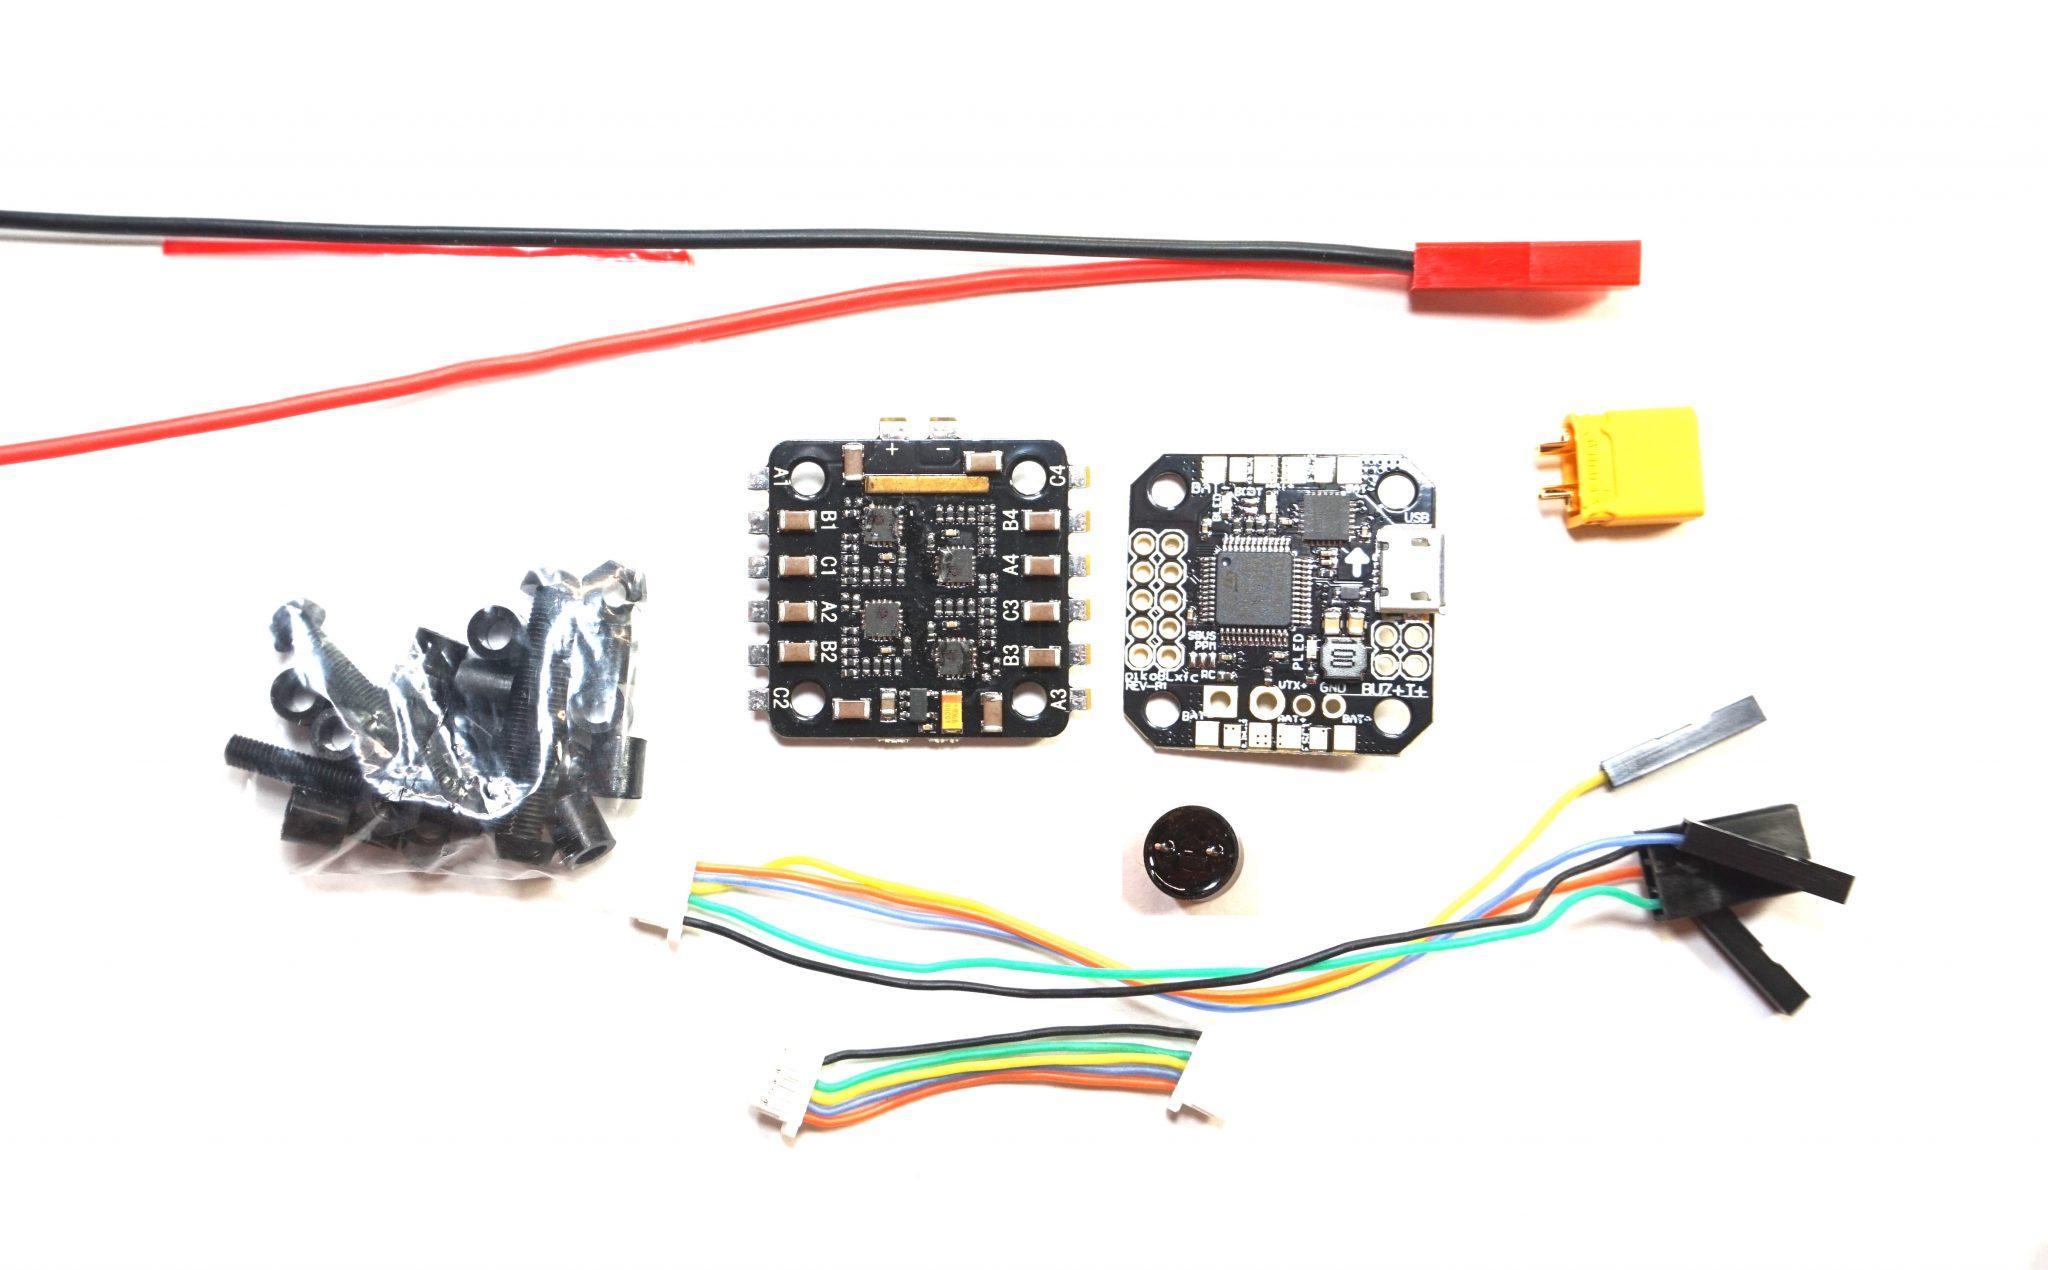 FlexRC Pico Core V1 - Bundle Kit